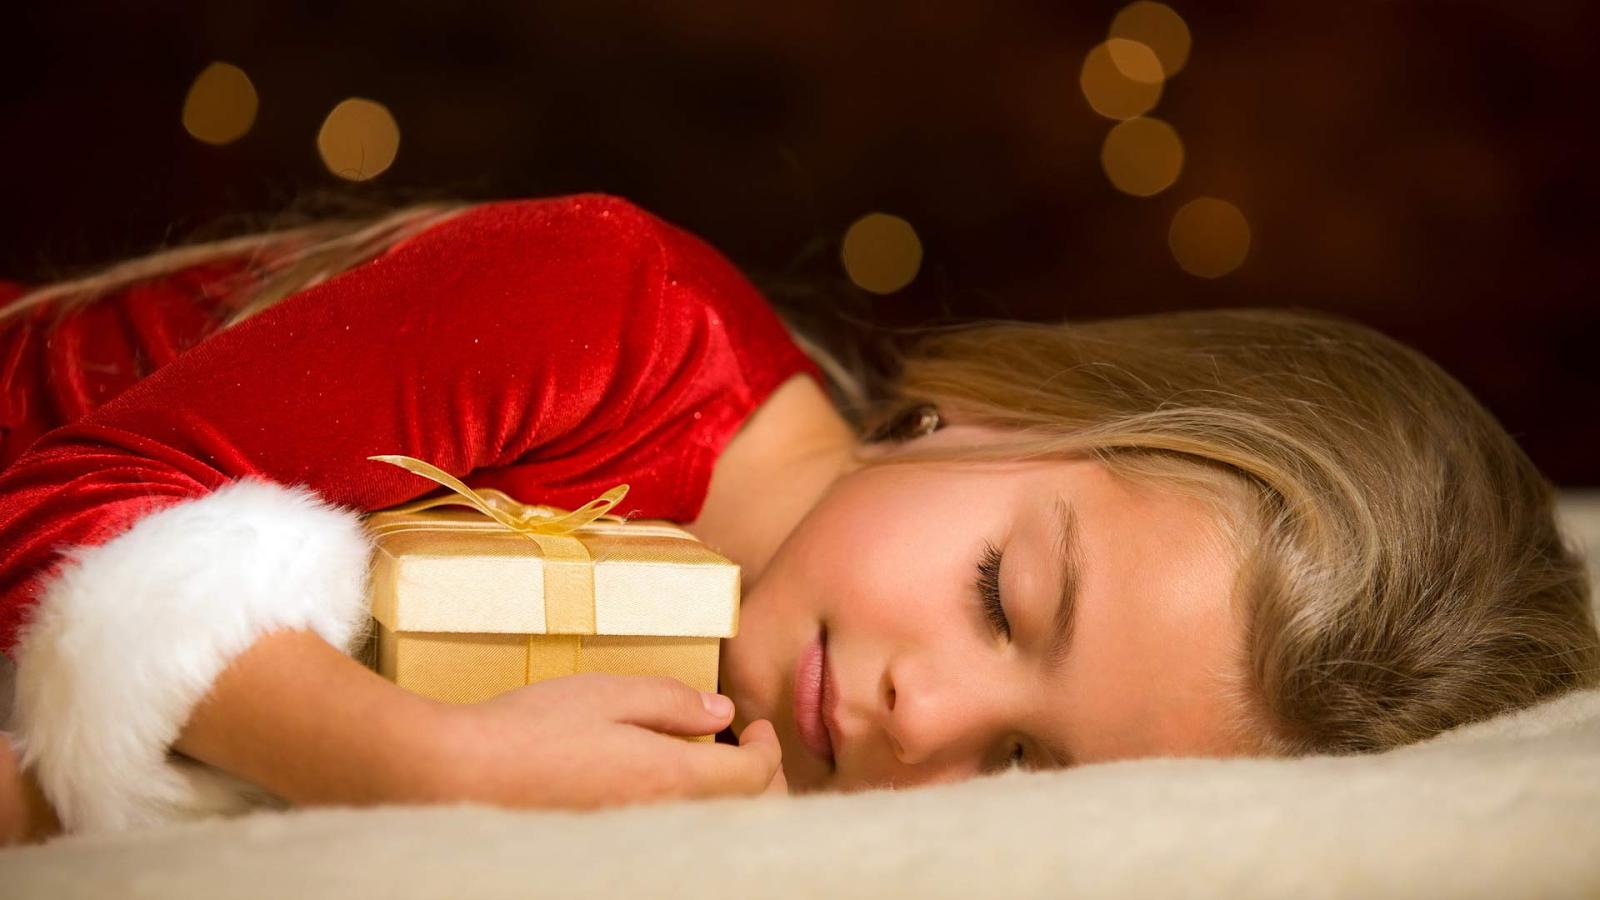 Гадание во сне на новый год